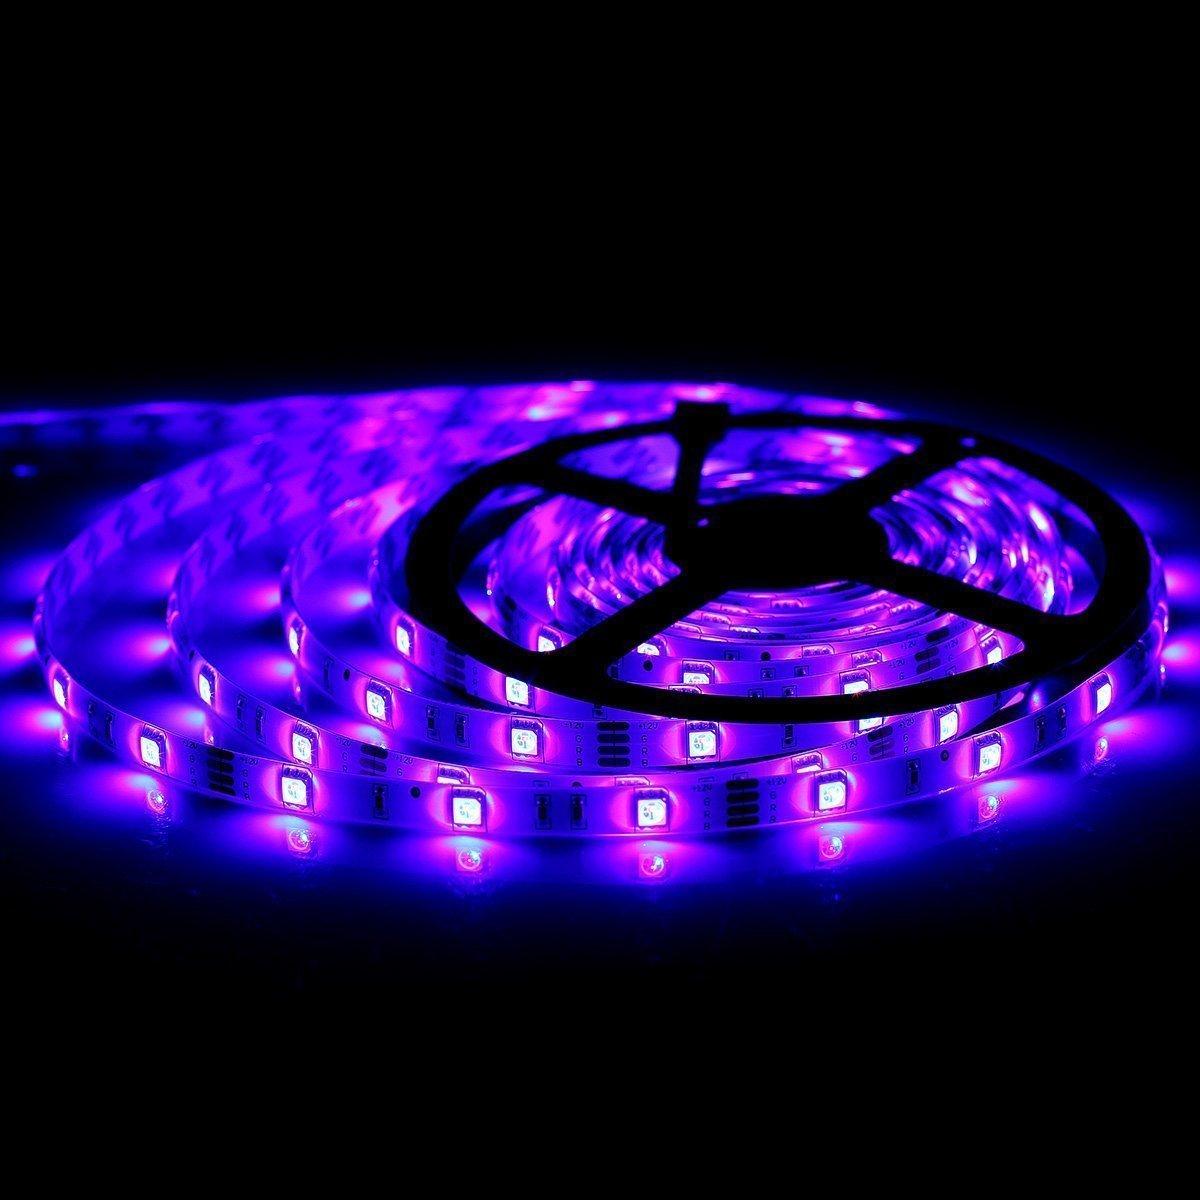 Lights Diagram Wiring Diagram For Led Strip Lights 2 Segment Led Light